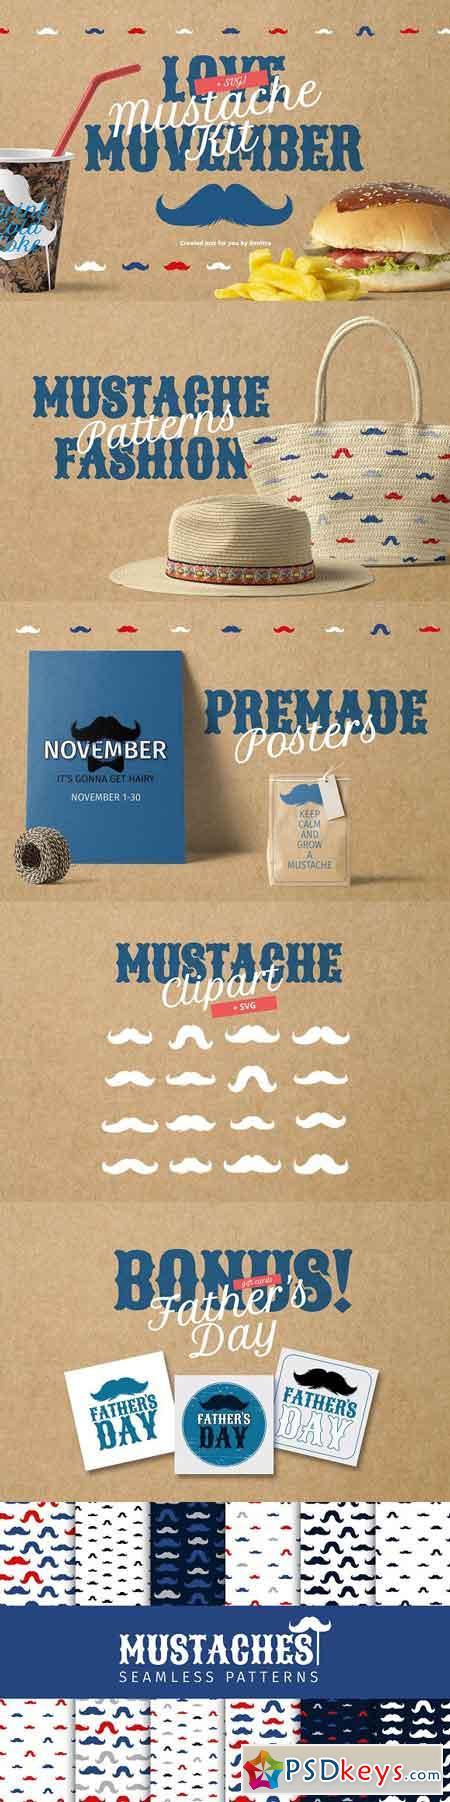 Movember Style Mustache Kit 2857949